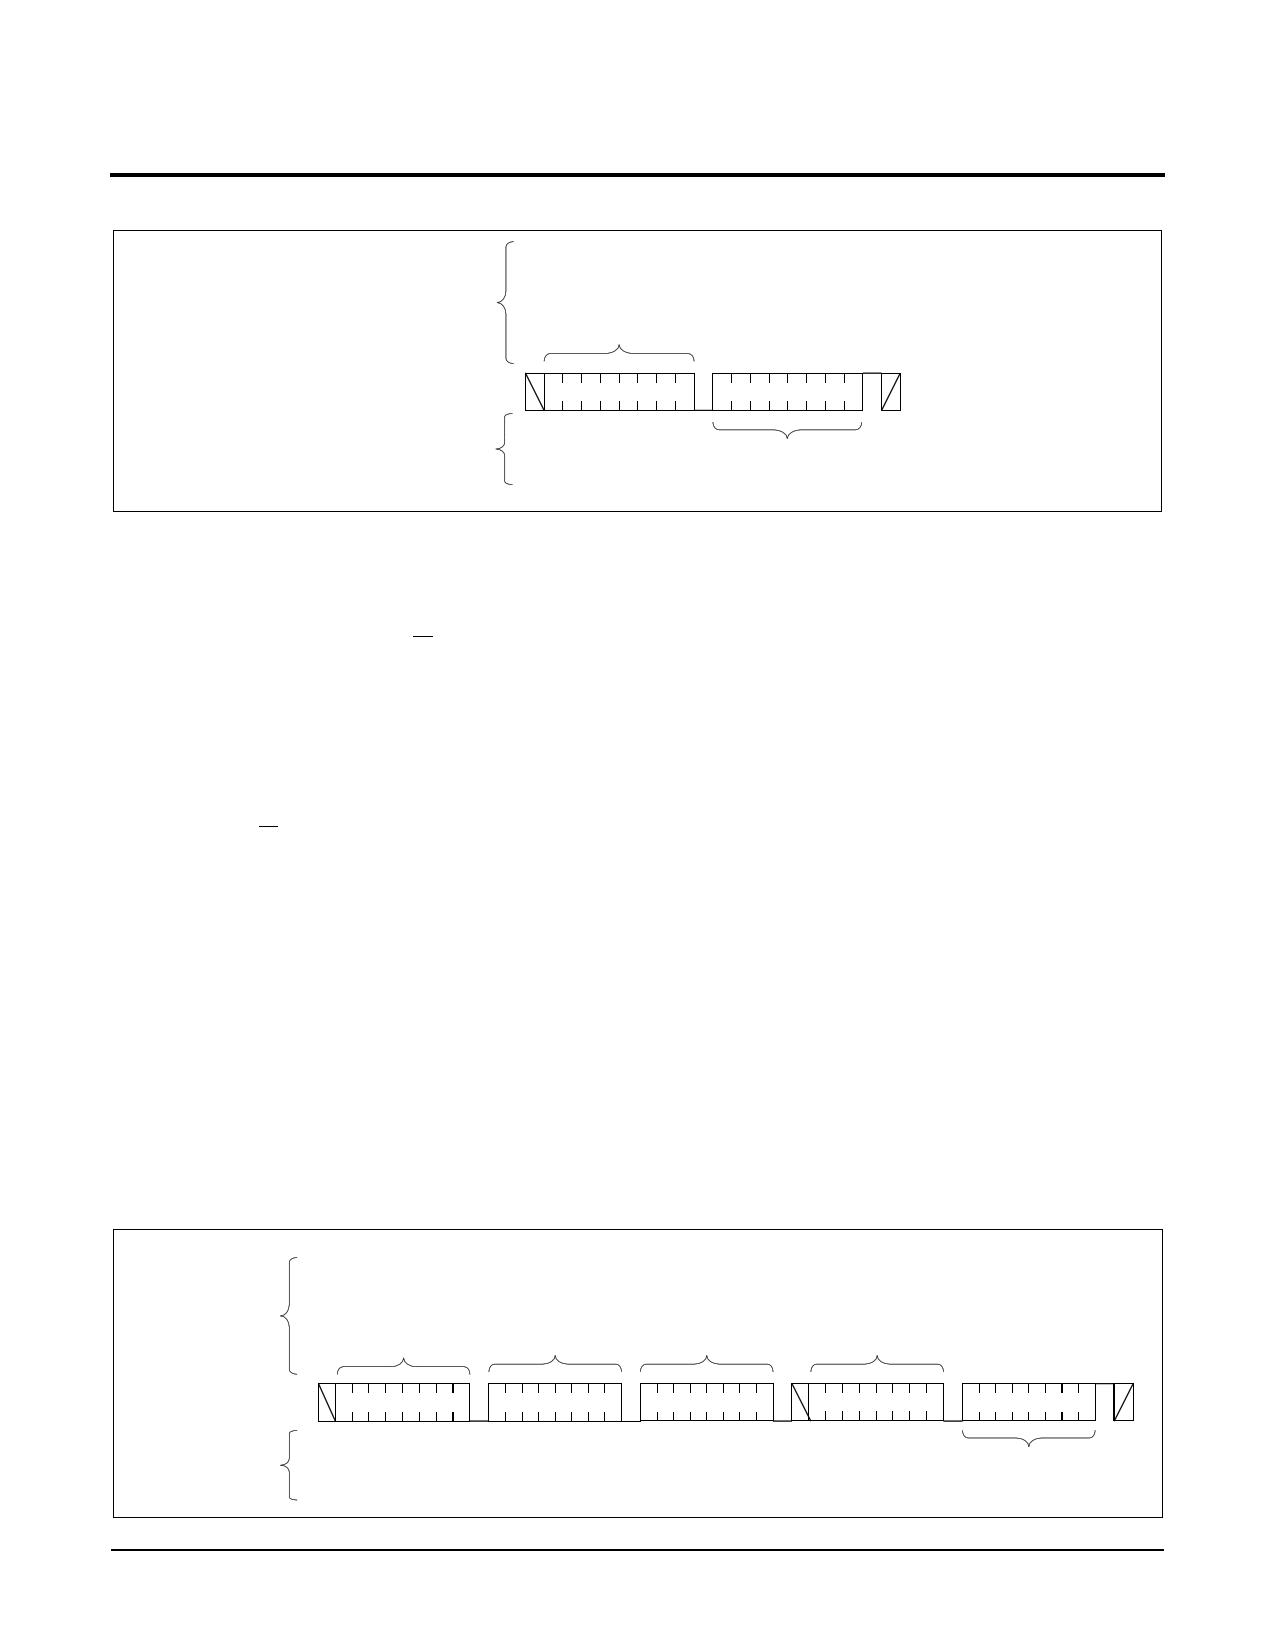 X1240S8I arduino